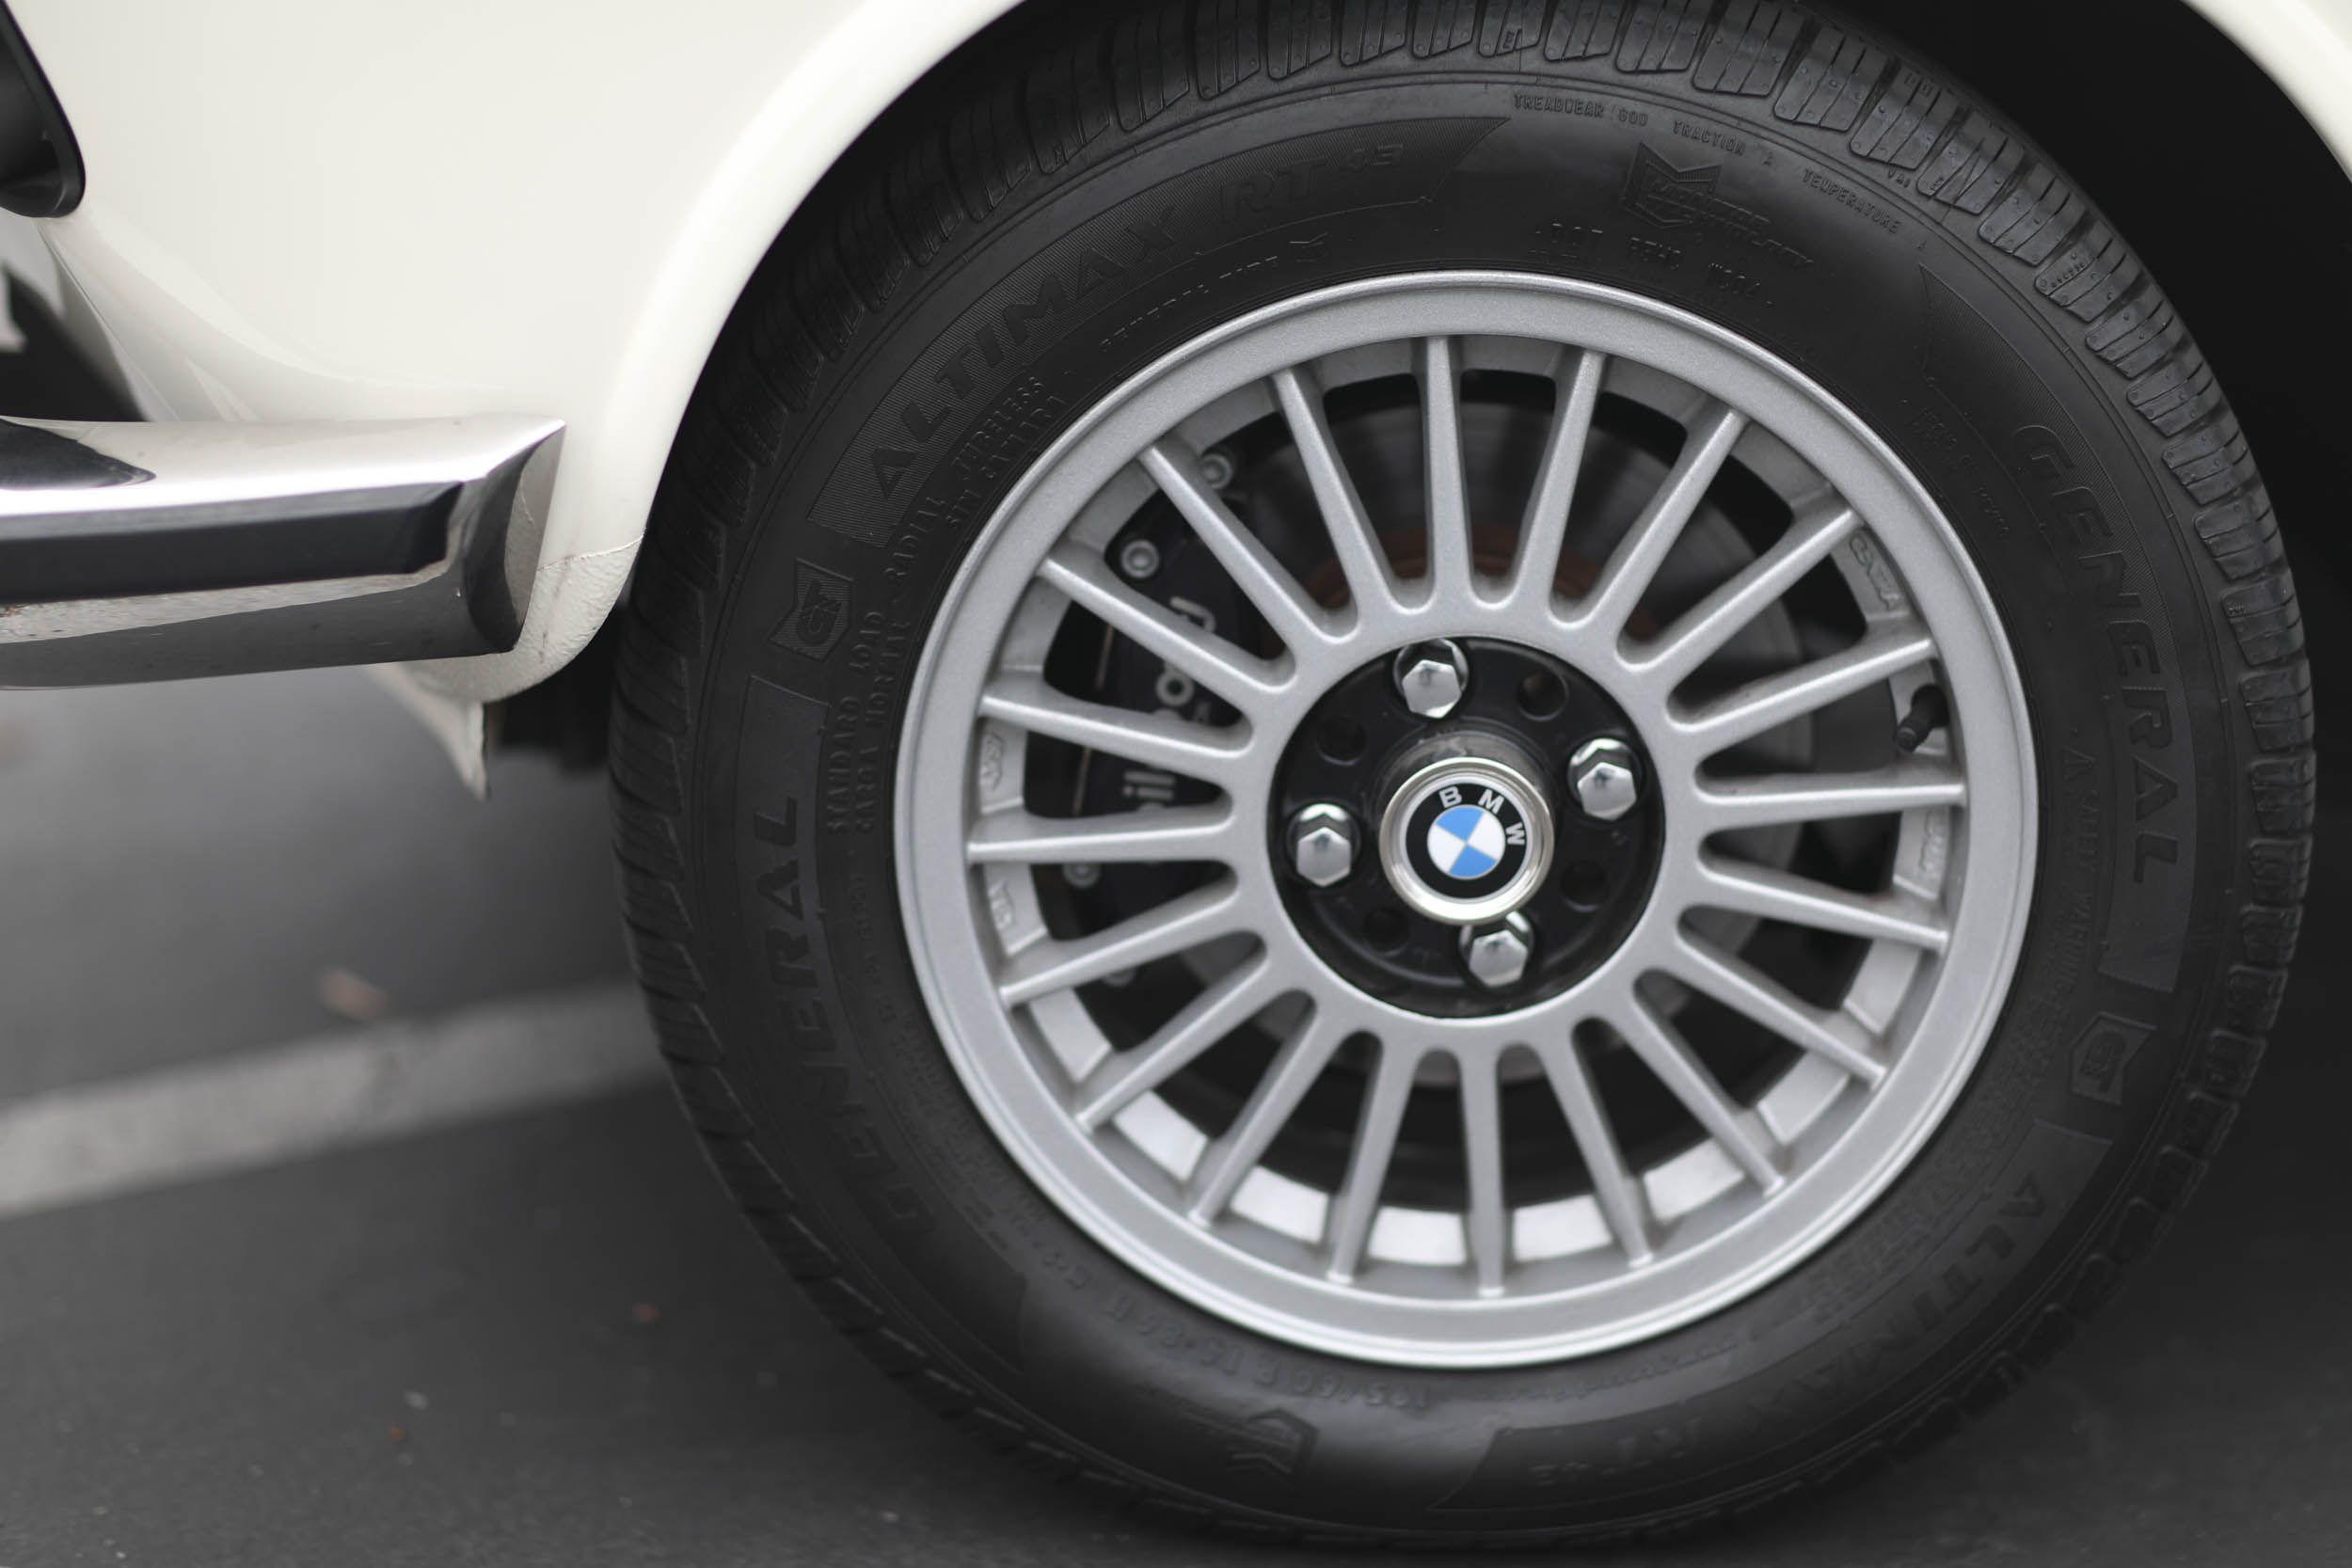 1975 BMW 2002 wheel detail